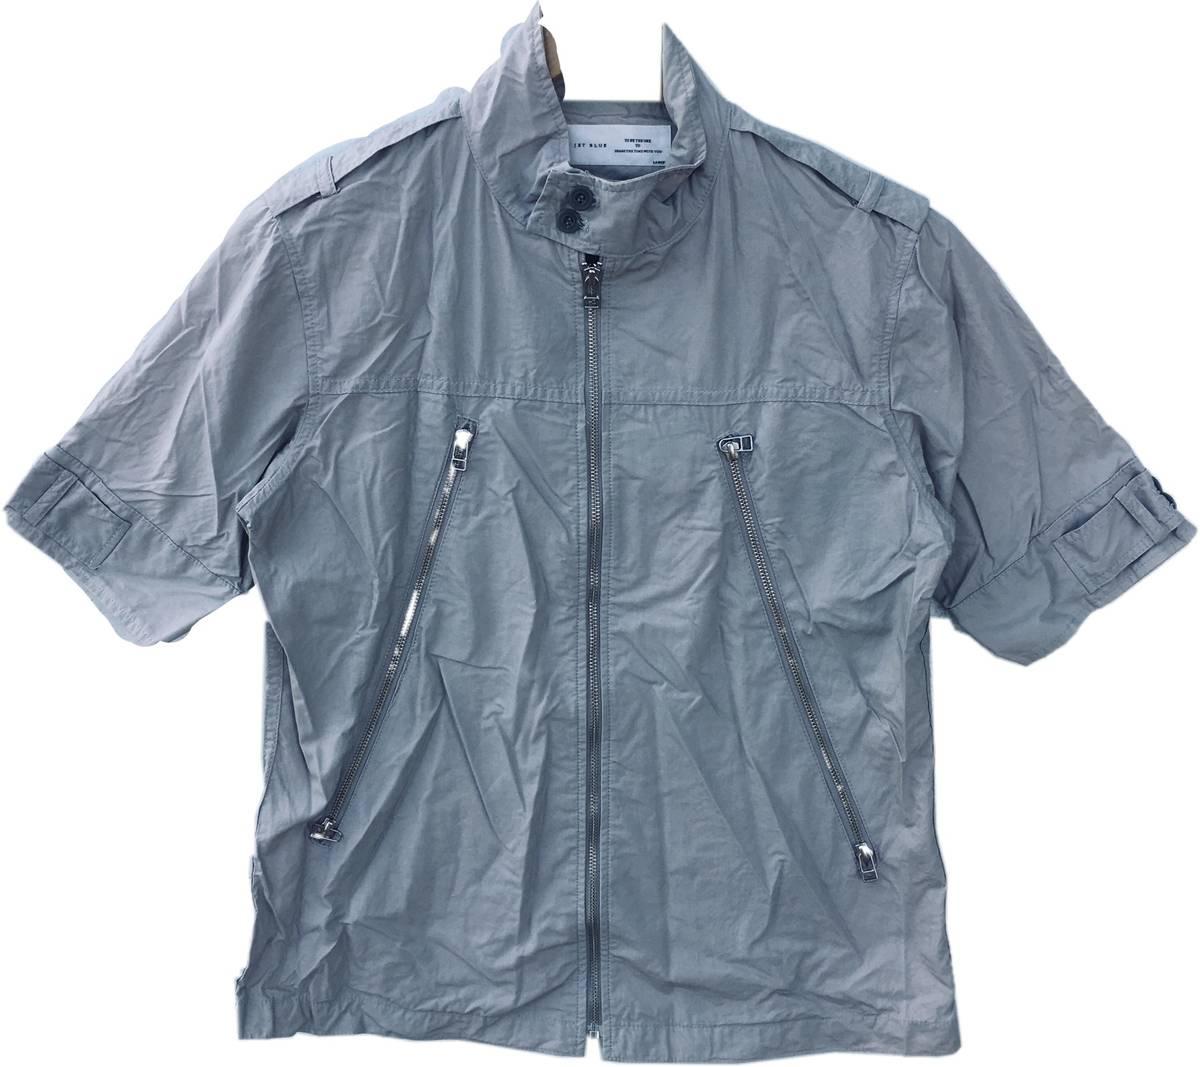 Ships Japan Japanese Brand Ships Punk Style Zip Up Polo Shirt Size M